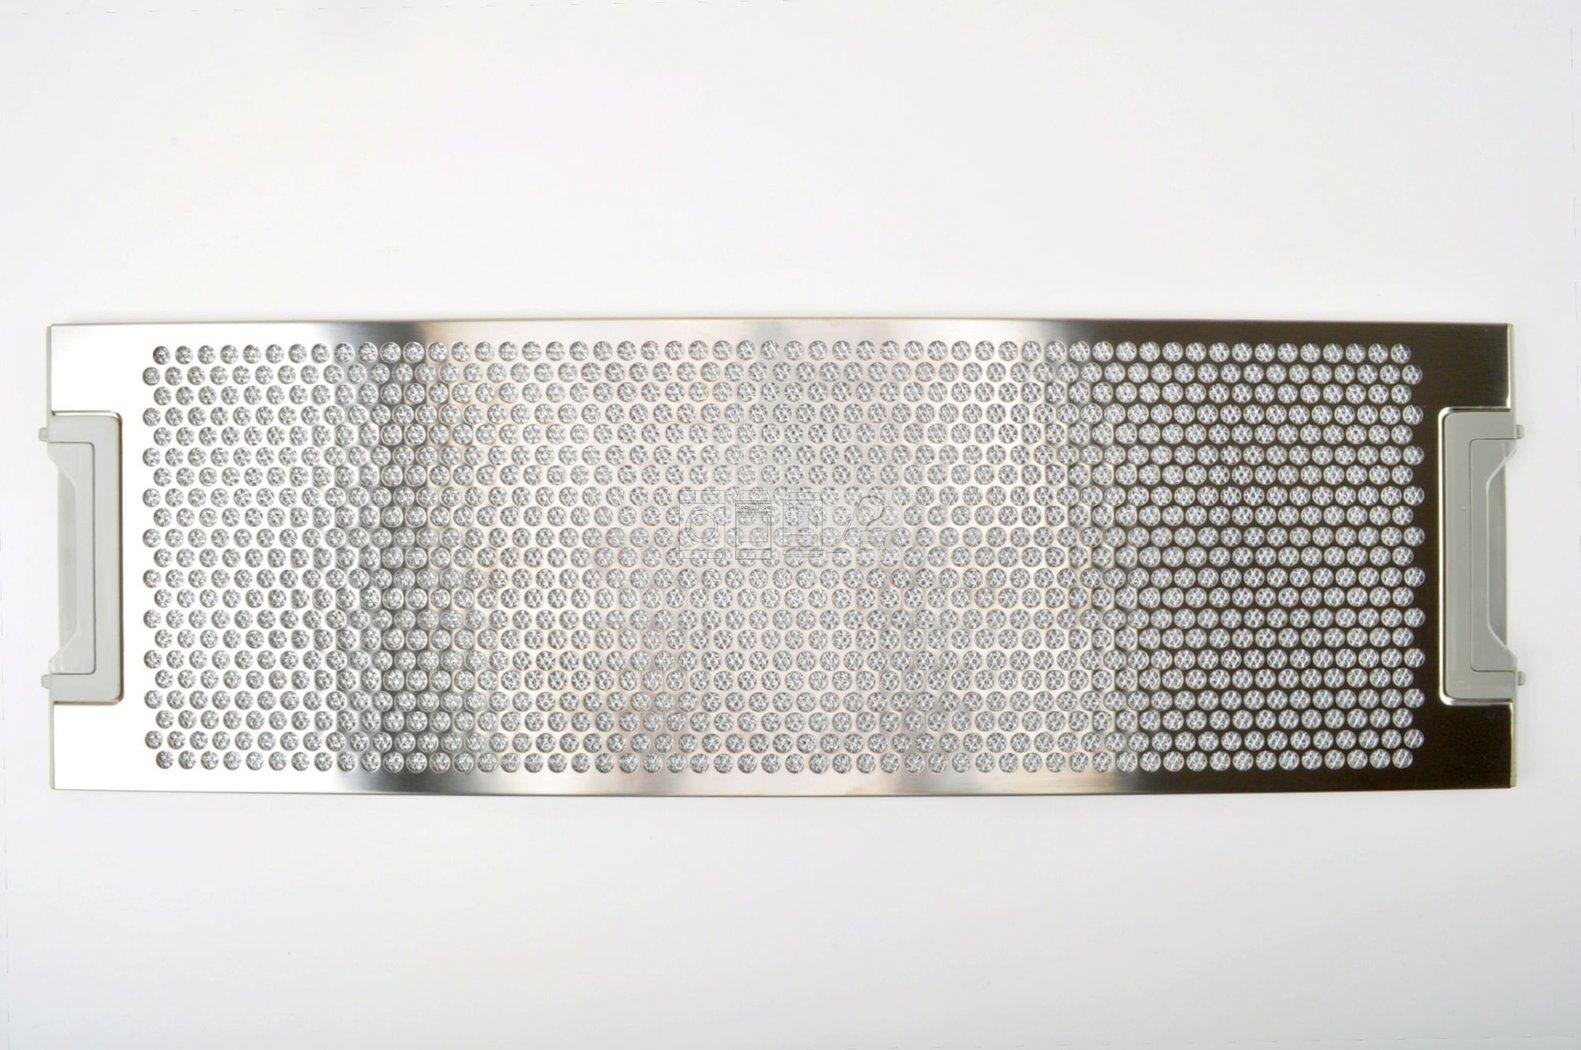 Aeg metallfilter dunstabzugshaube fettfilter gitter